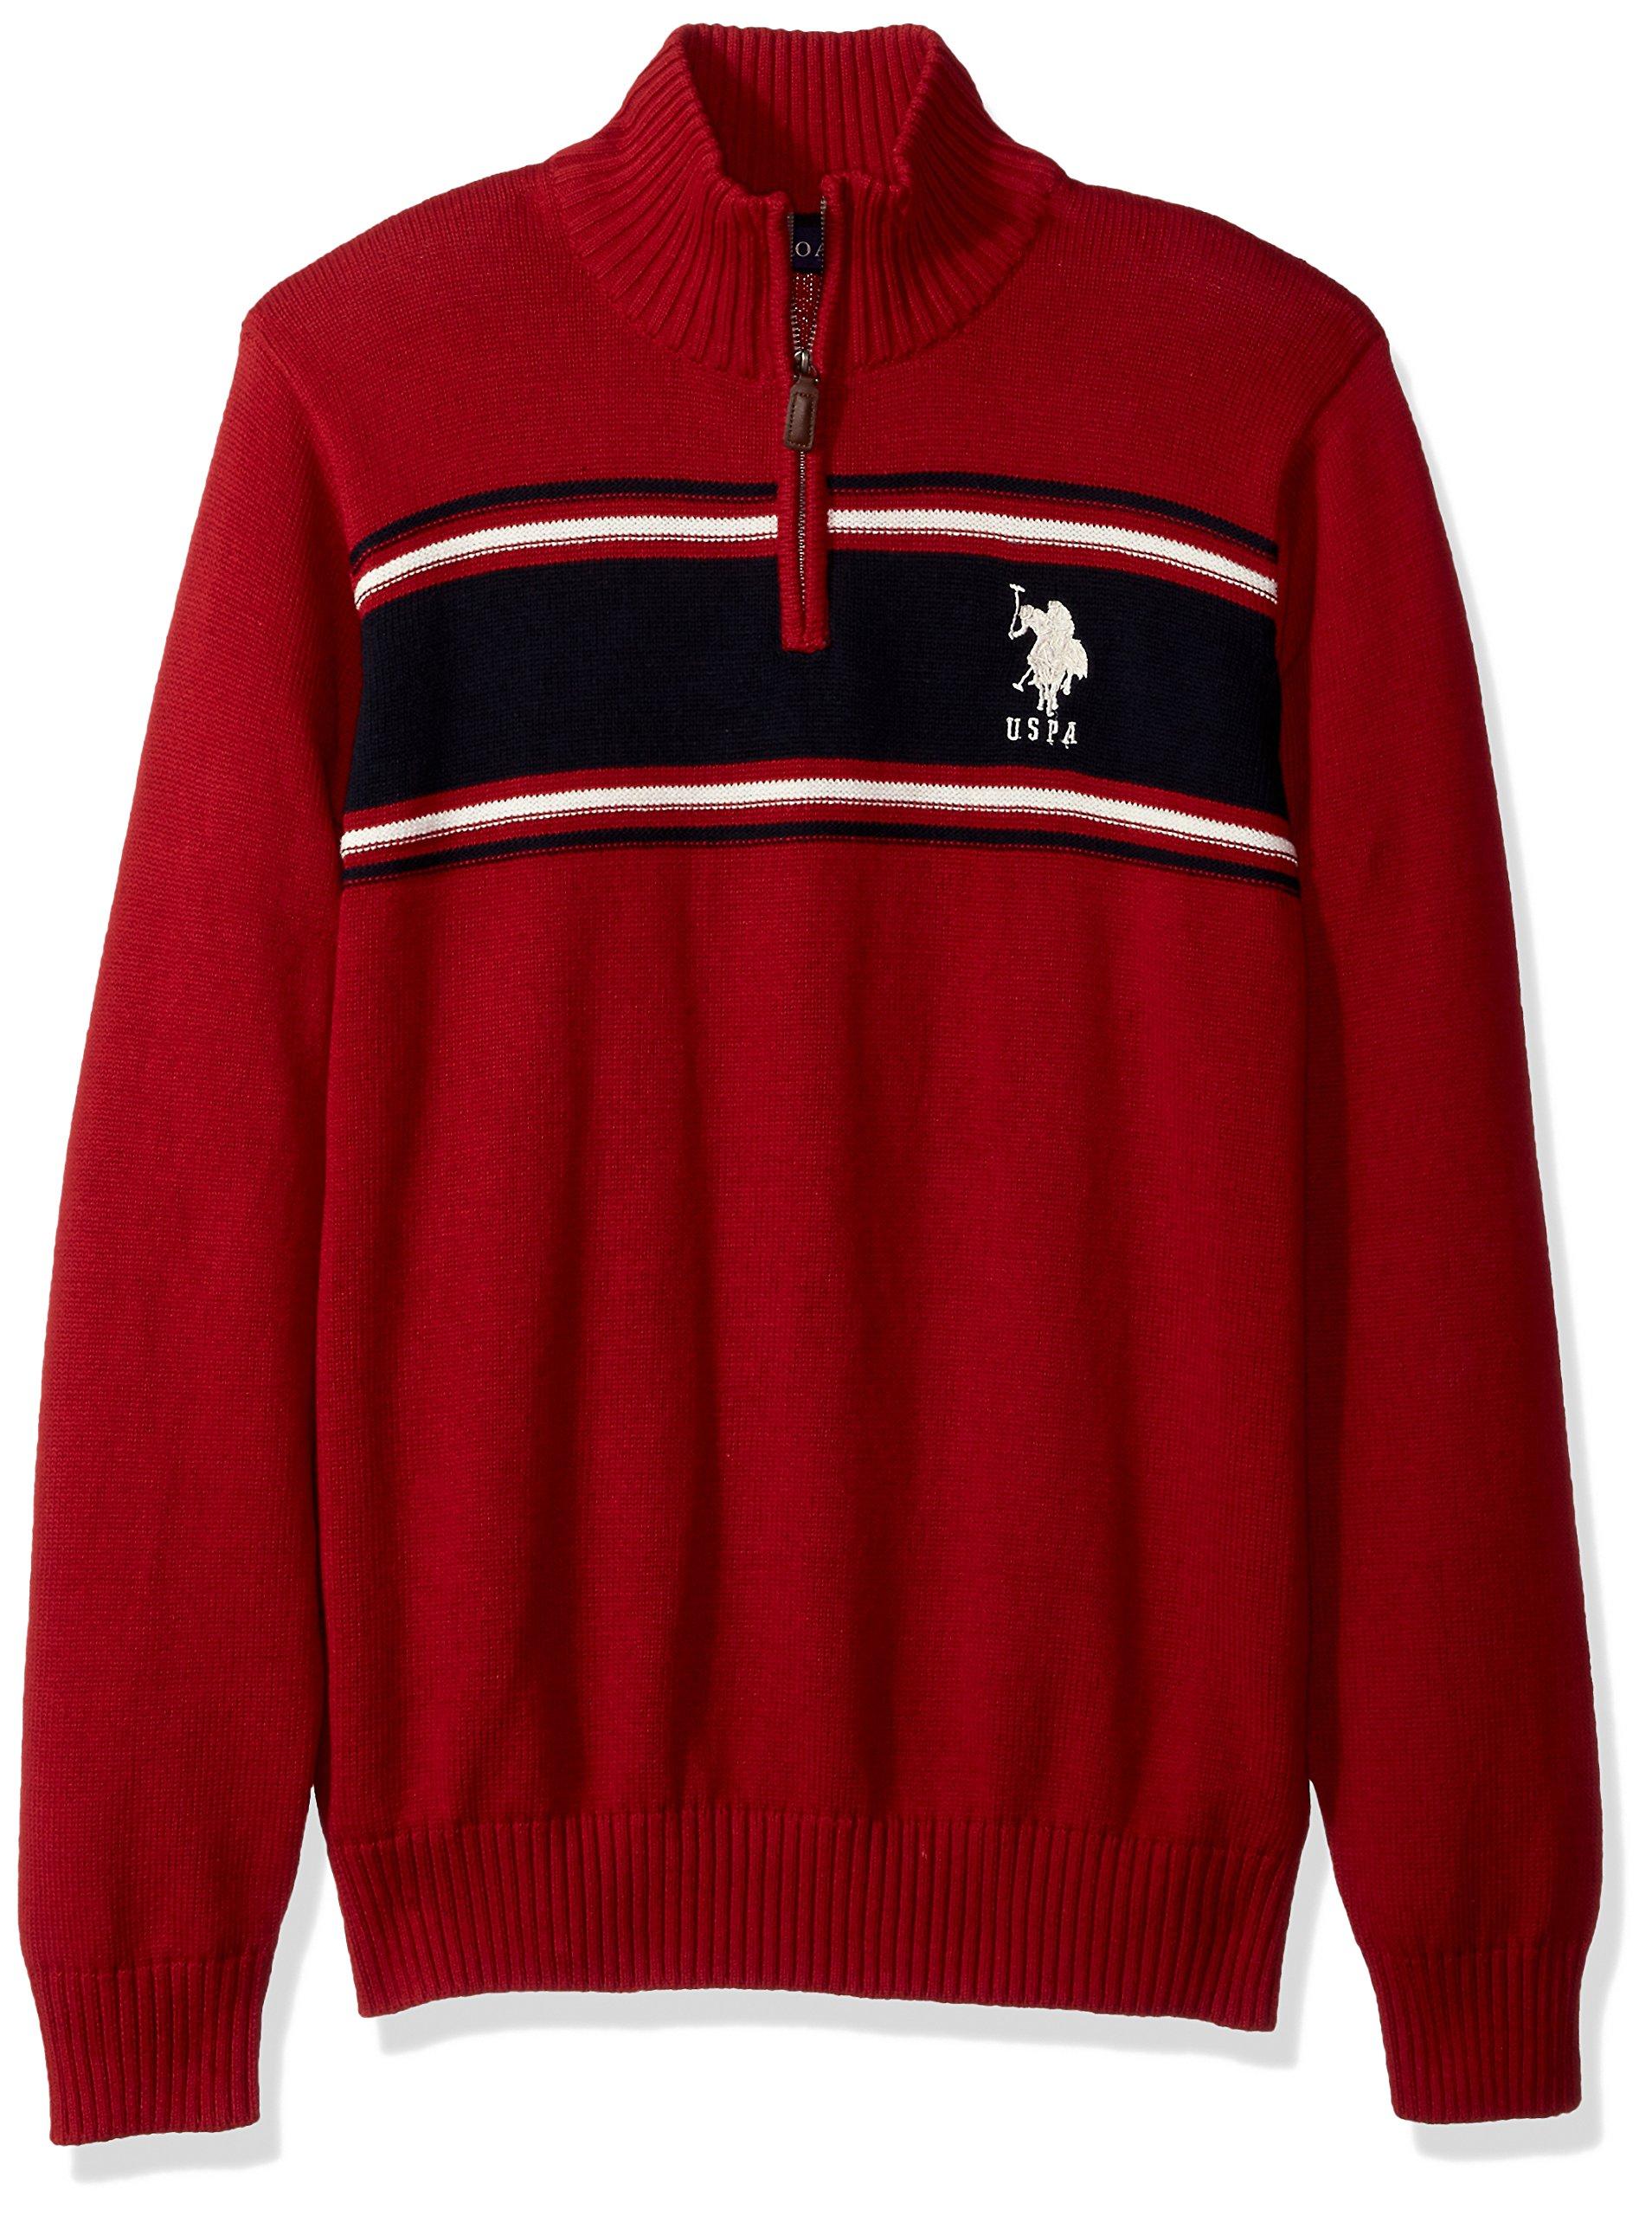 U.S. Polo Assn. Men's Chest Stripe 1/4 Zip Sweater, Apple Cinnamon, Medium